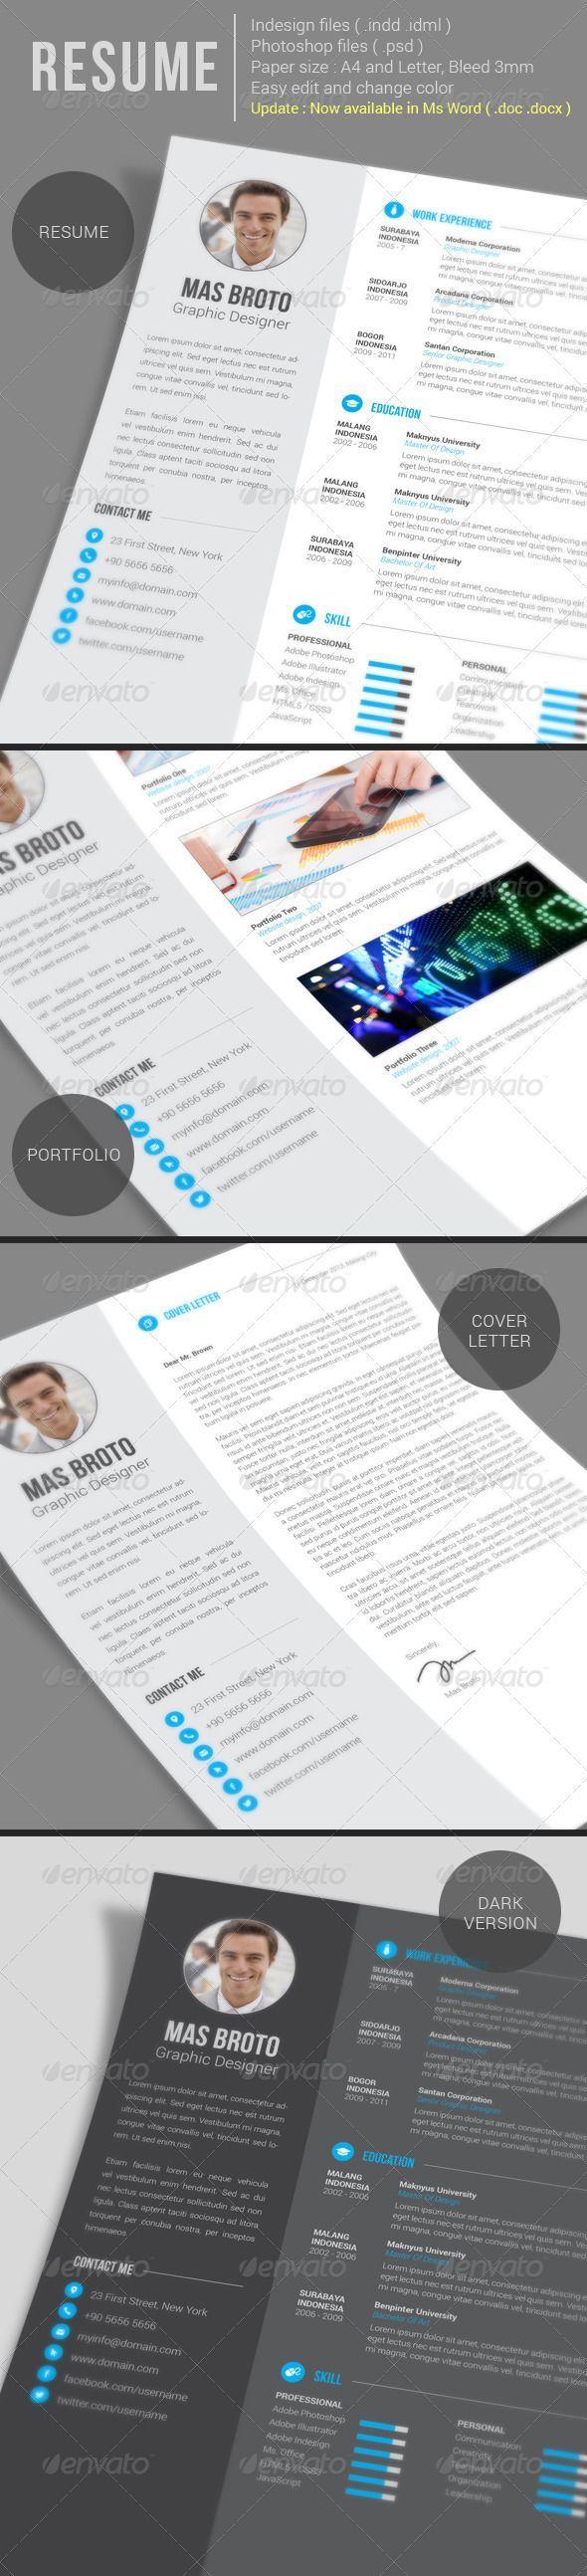 44 best RESUME images on Pinterest | Resume design, Design resume ...